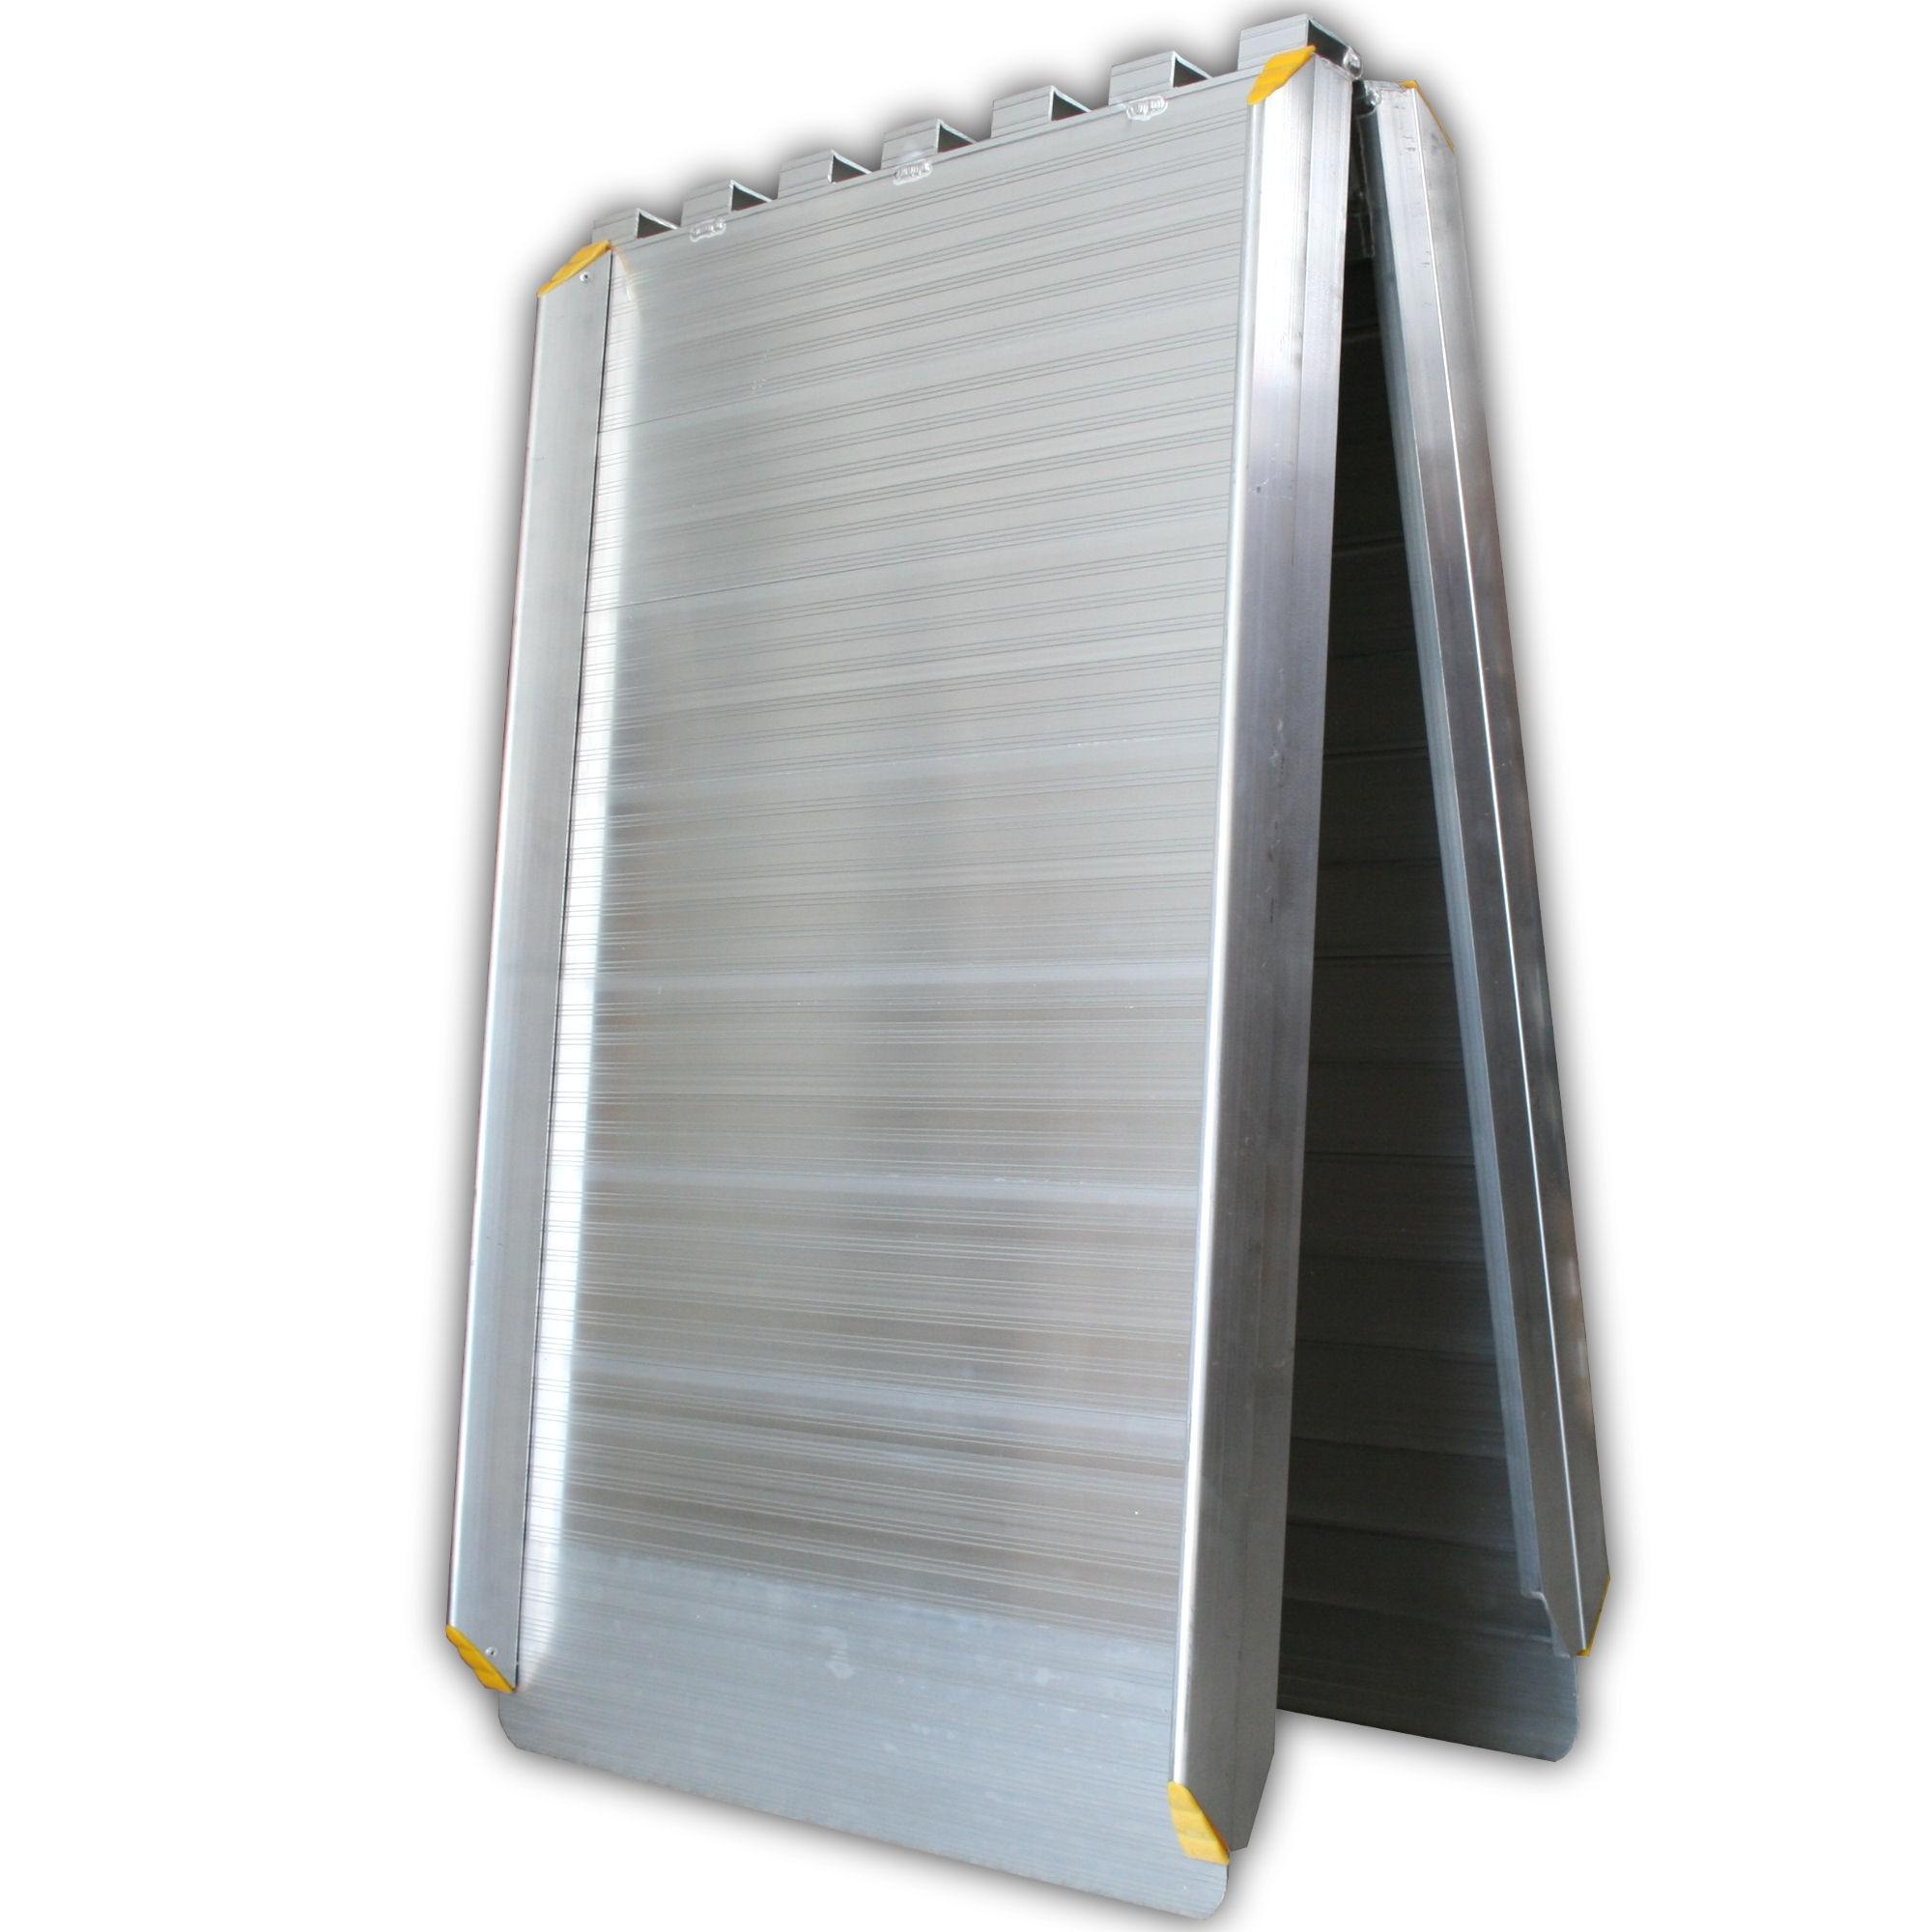 klapprampe aluminium rampe klappbar rollstuhlrampe 244cm mobil alu verladerampe rampen klappbare. Black Bedroom Furniture Sets. Home Design Ideas